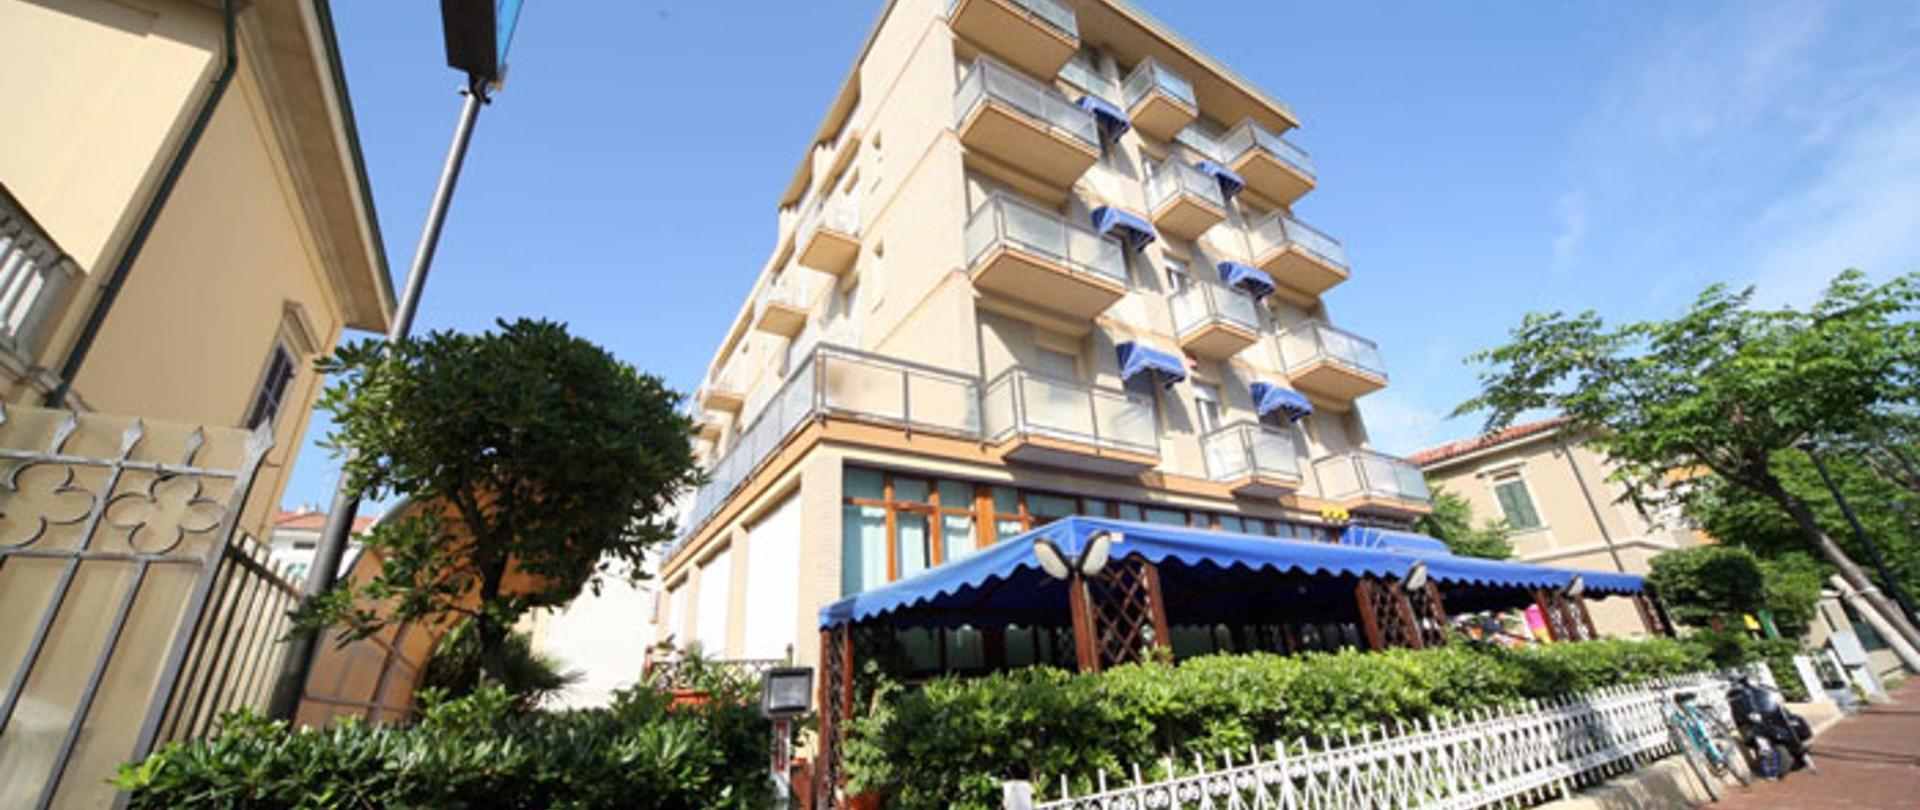 esterno-hotel-